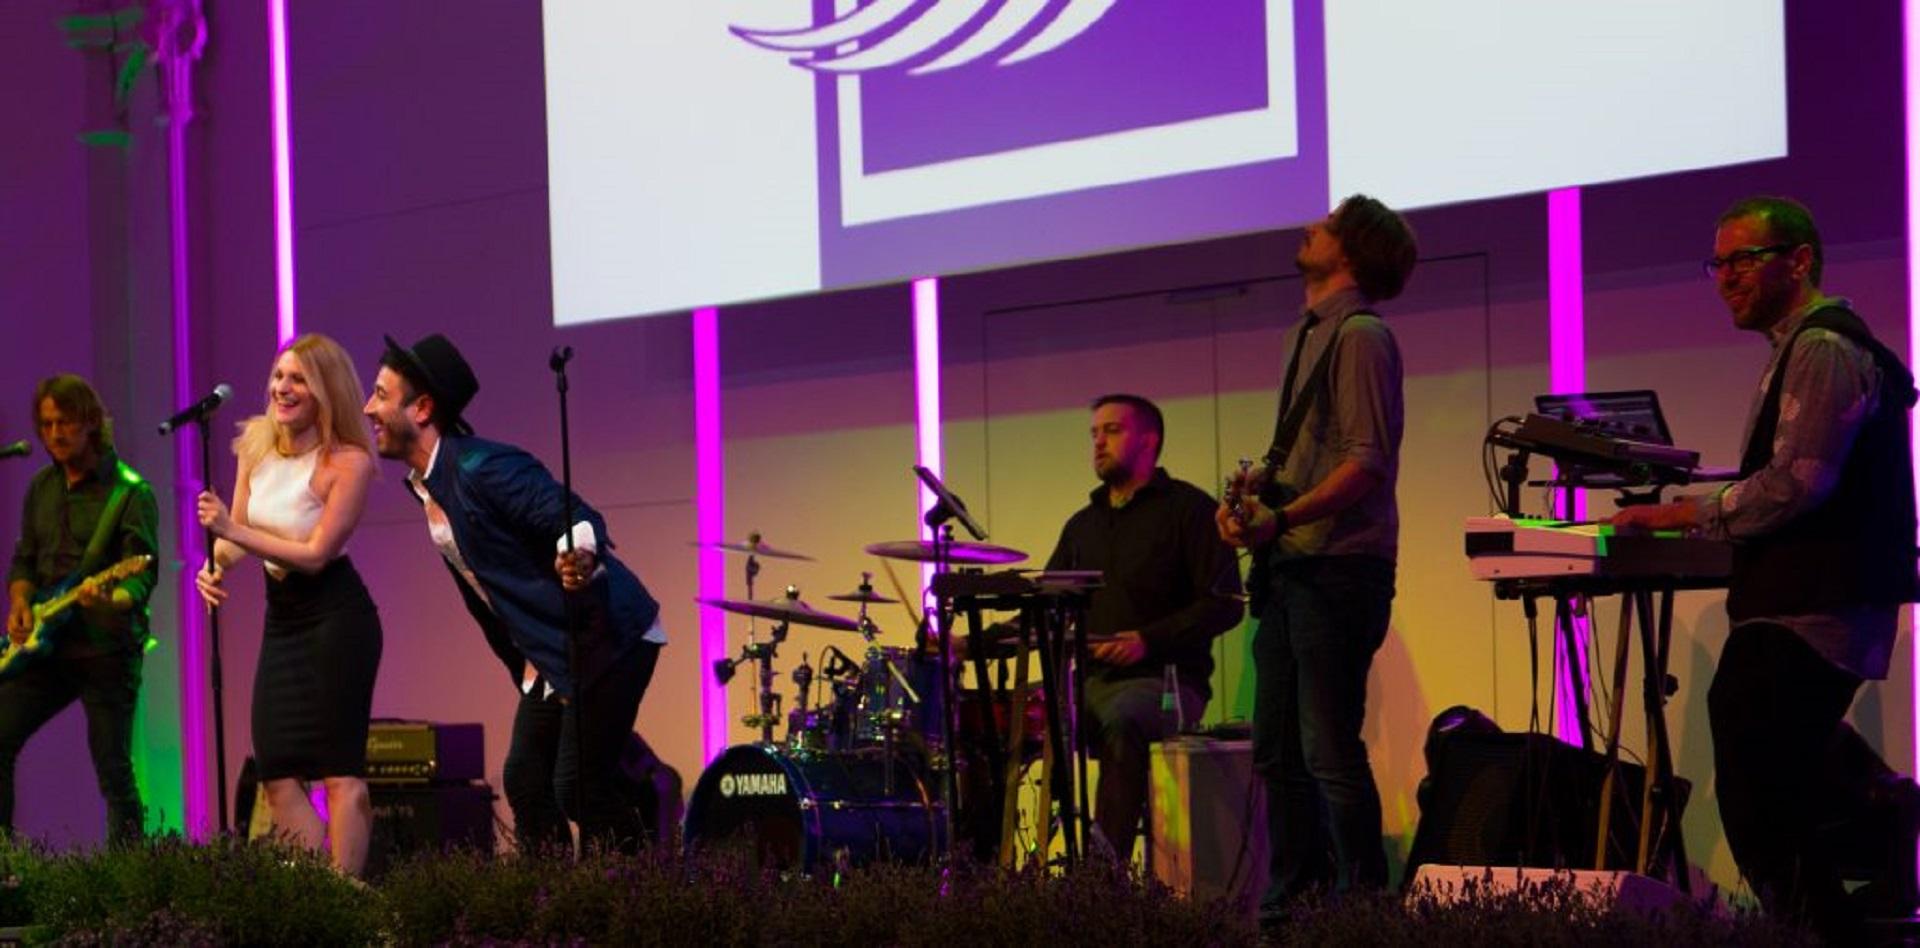 IMG_1738-1024x506-1 Live-Band für Event, Messe, Gala, Show